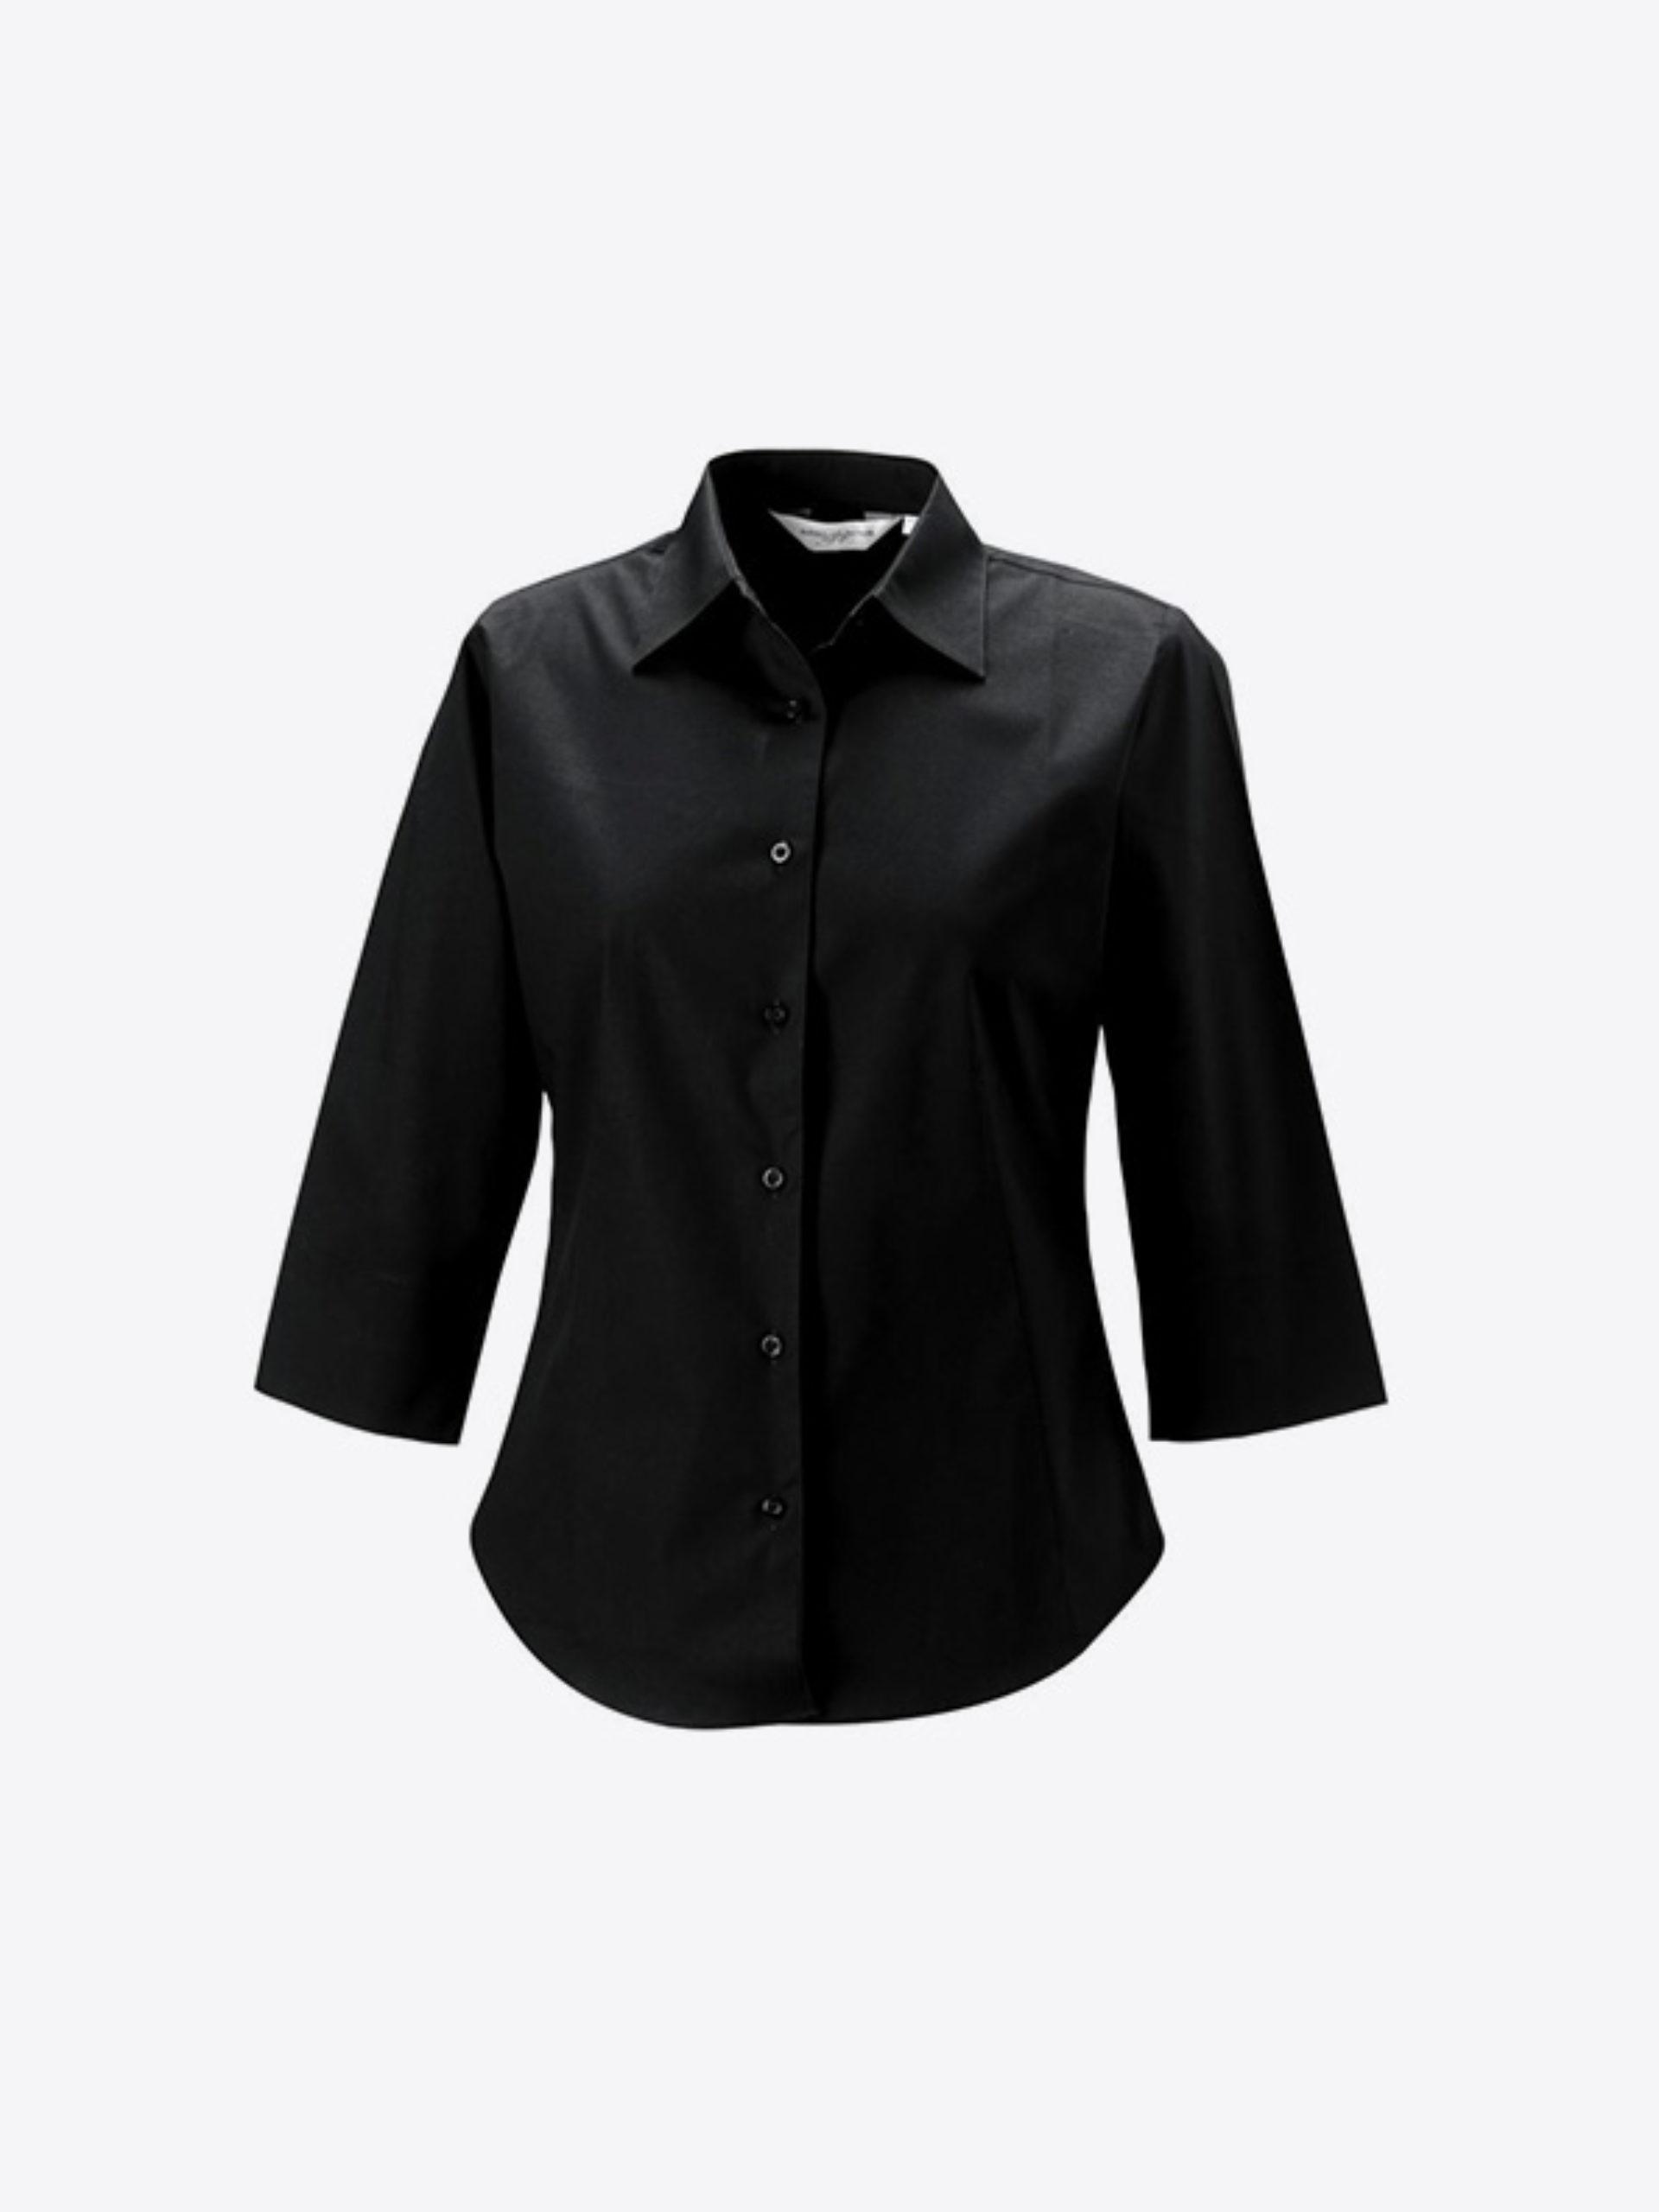 Hemd Damen Drucken Halblange Aermel Besticken Russell 946f Farbe Black